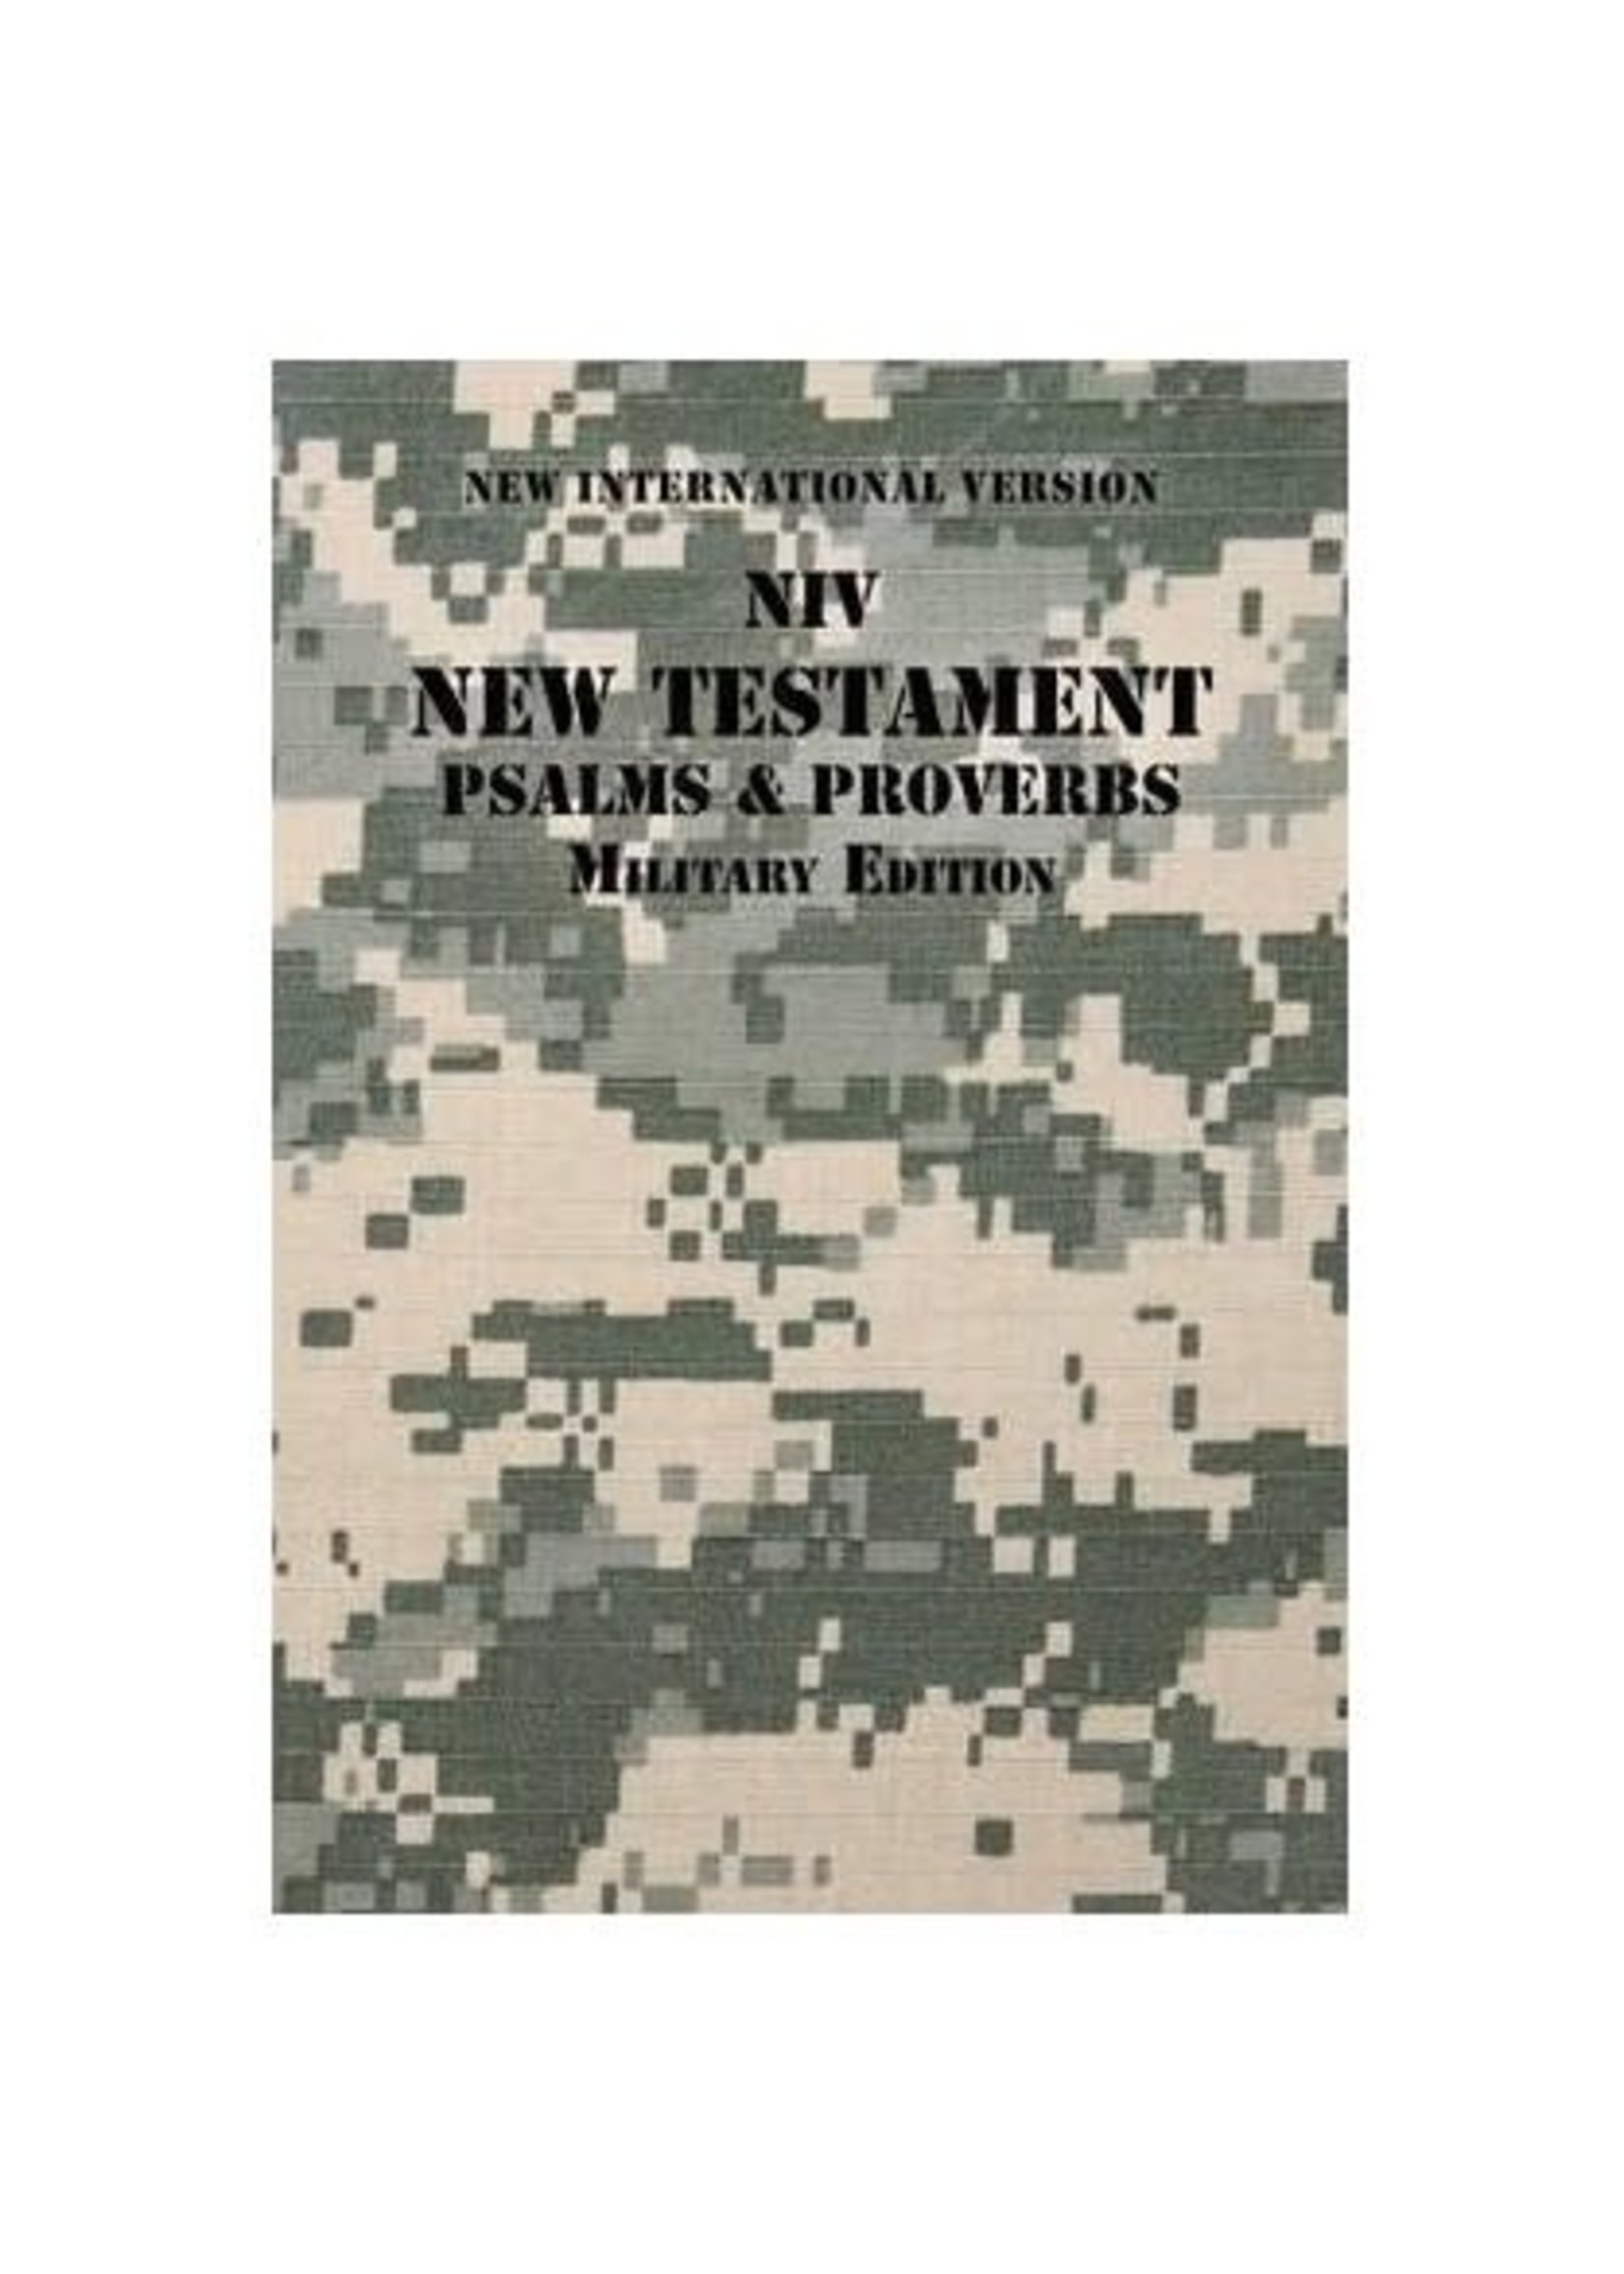 NIV New Testament Military Edition